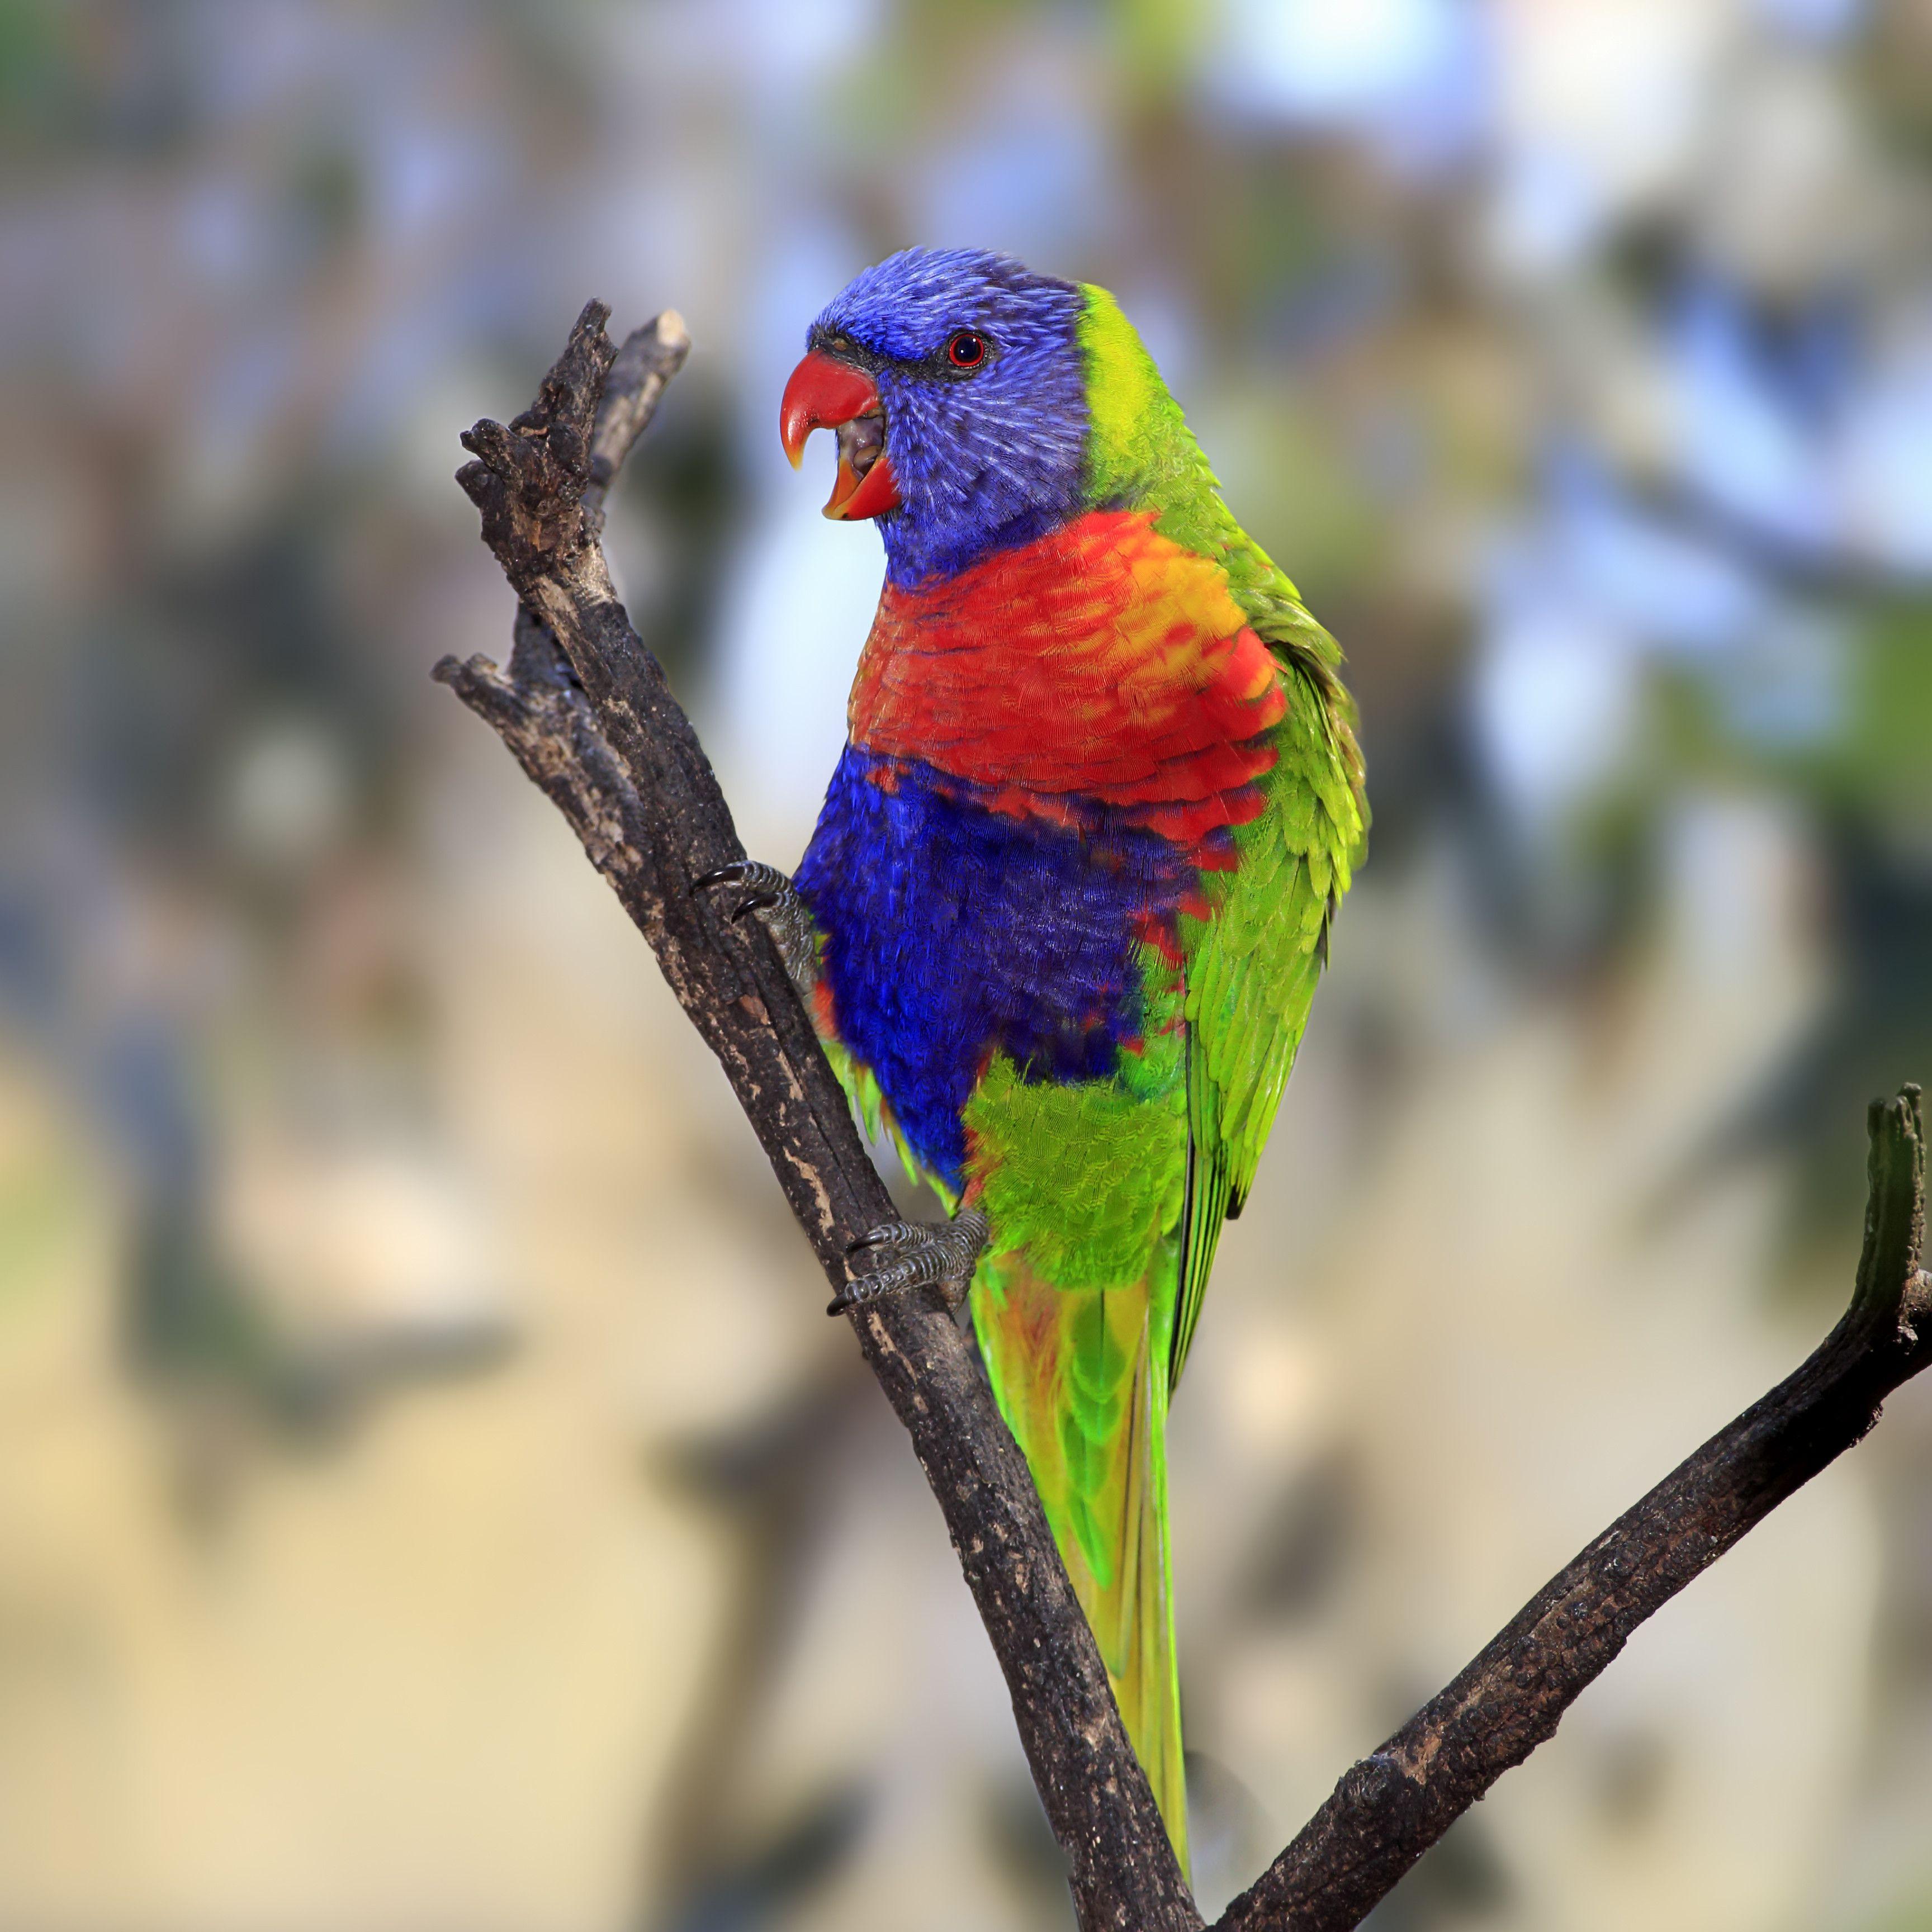 Rainbow Lorikeet -Trichoglossus haematodus-, adult bird perched on a tree, calling, South Australia, Australia